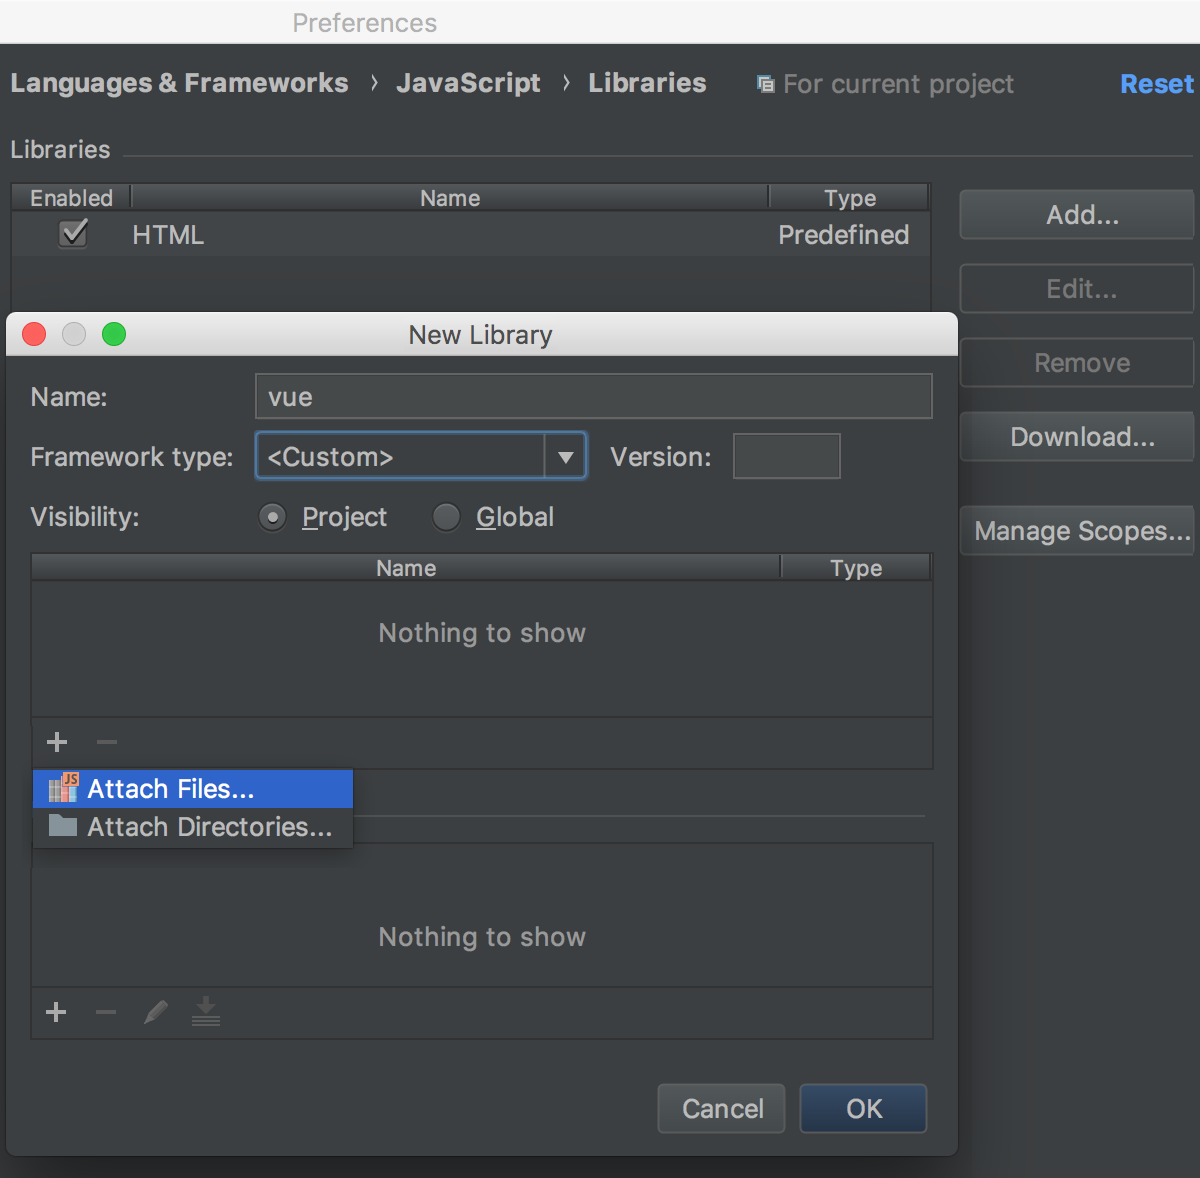 ws_js_configure_libraries_add_custom.png